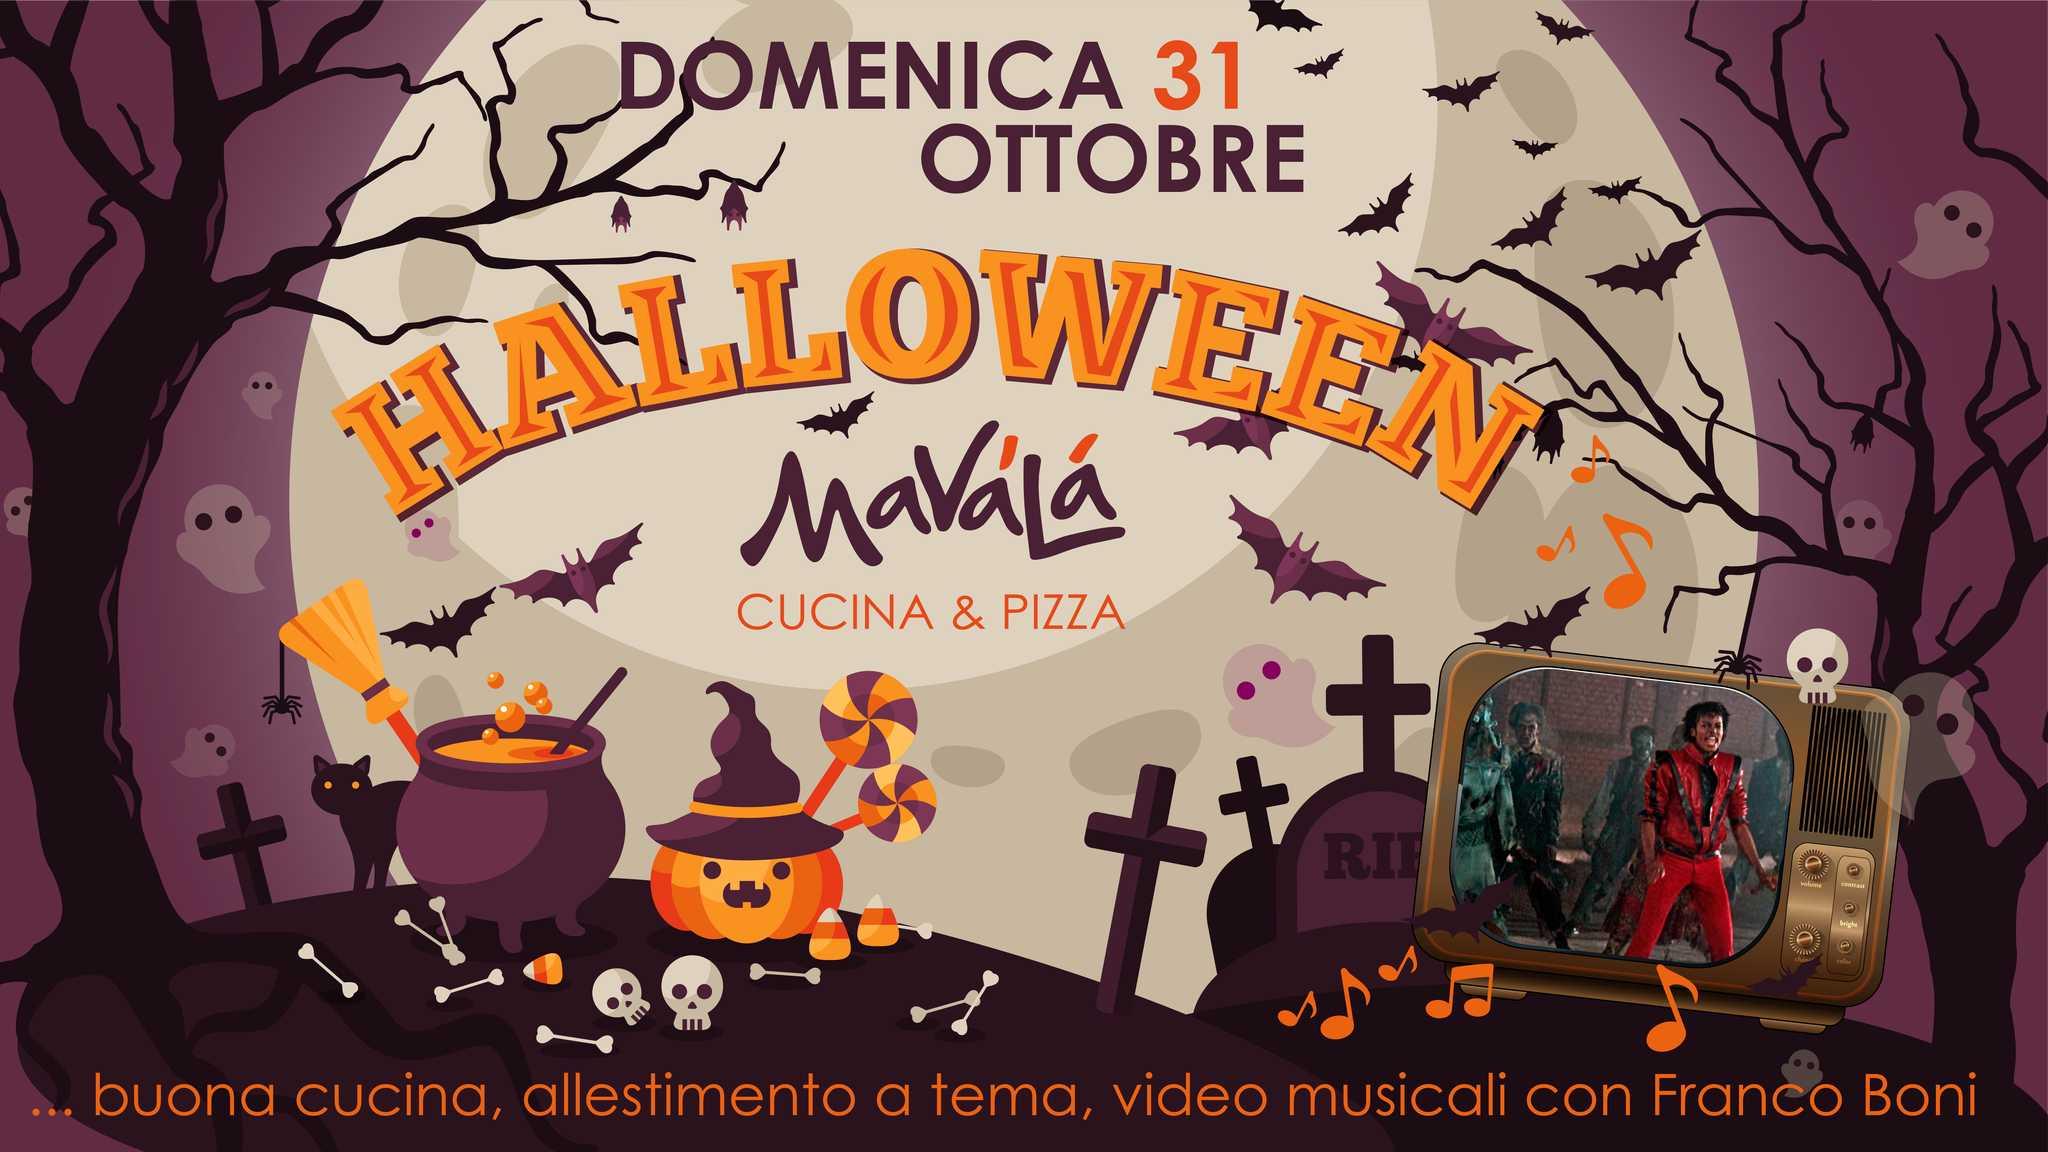 MAVALA_LOCANDINE_OTTOBRE_31_HALLOWEEN-04____